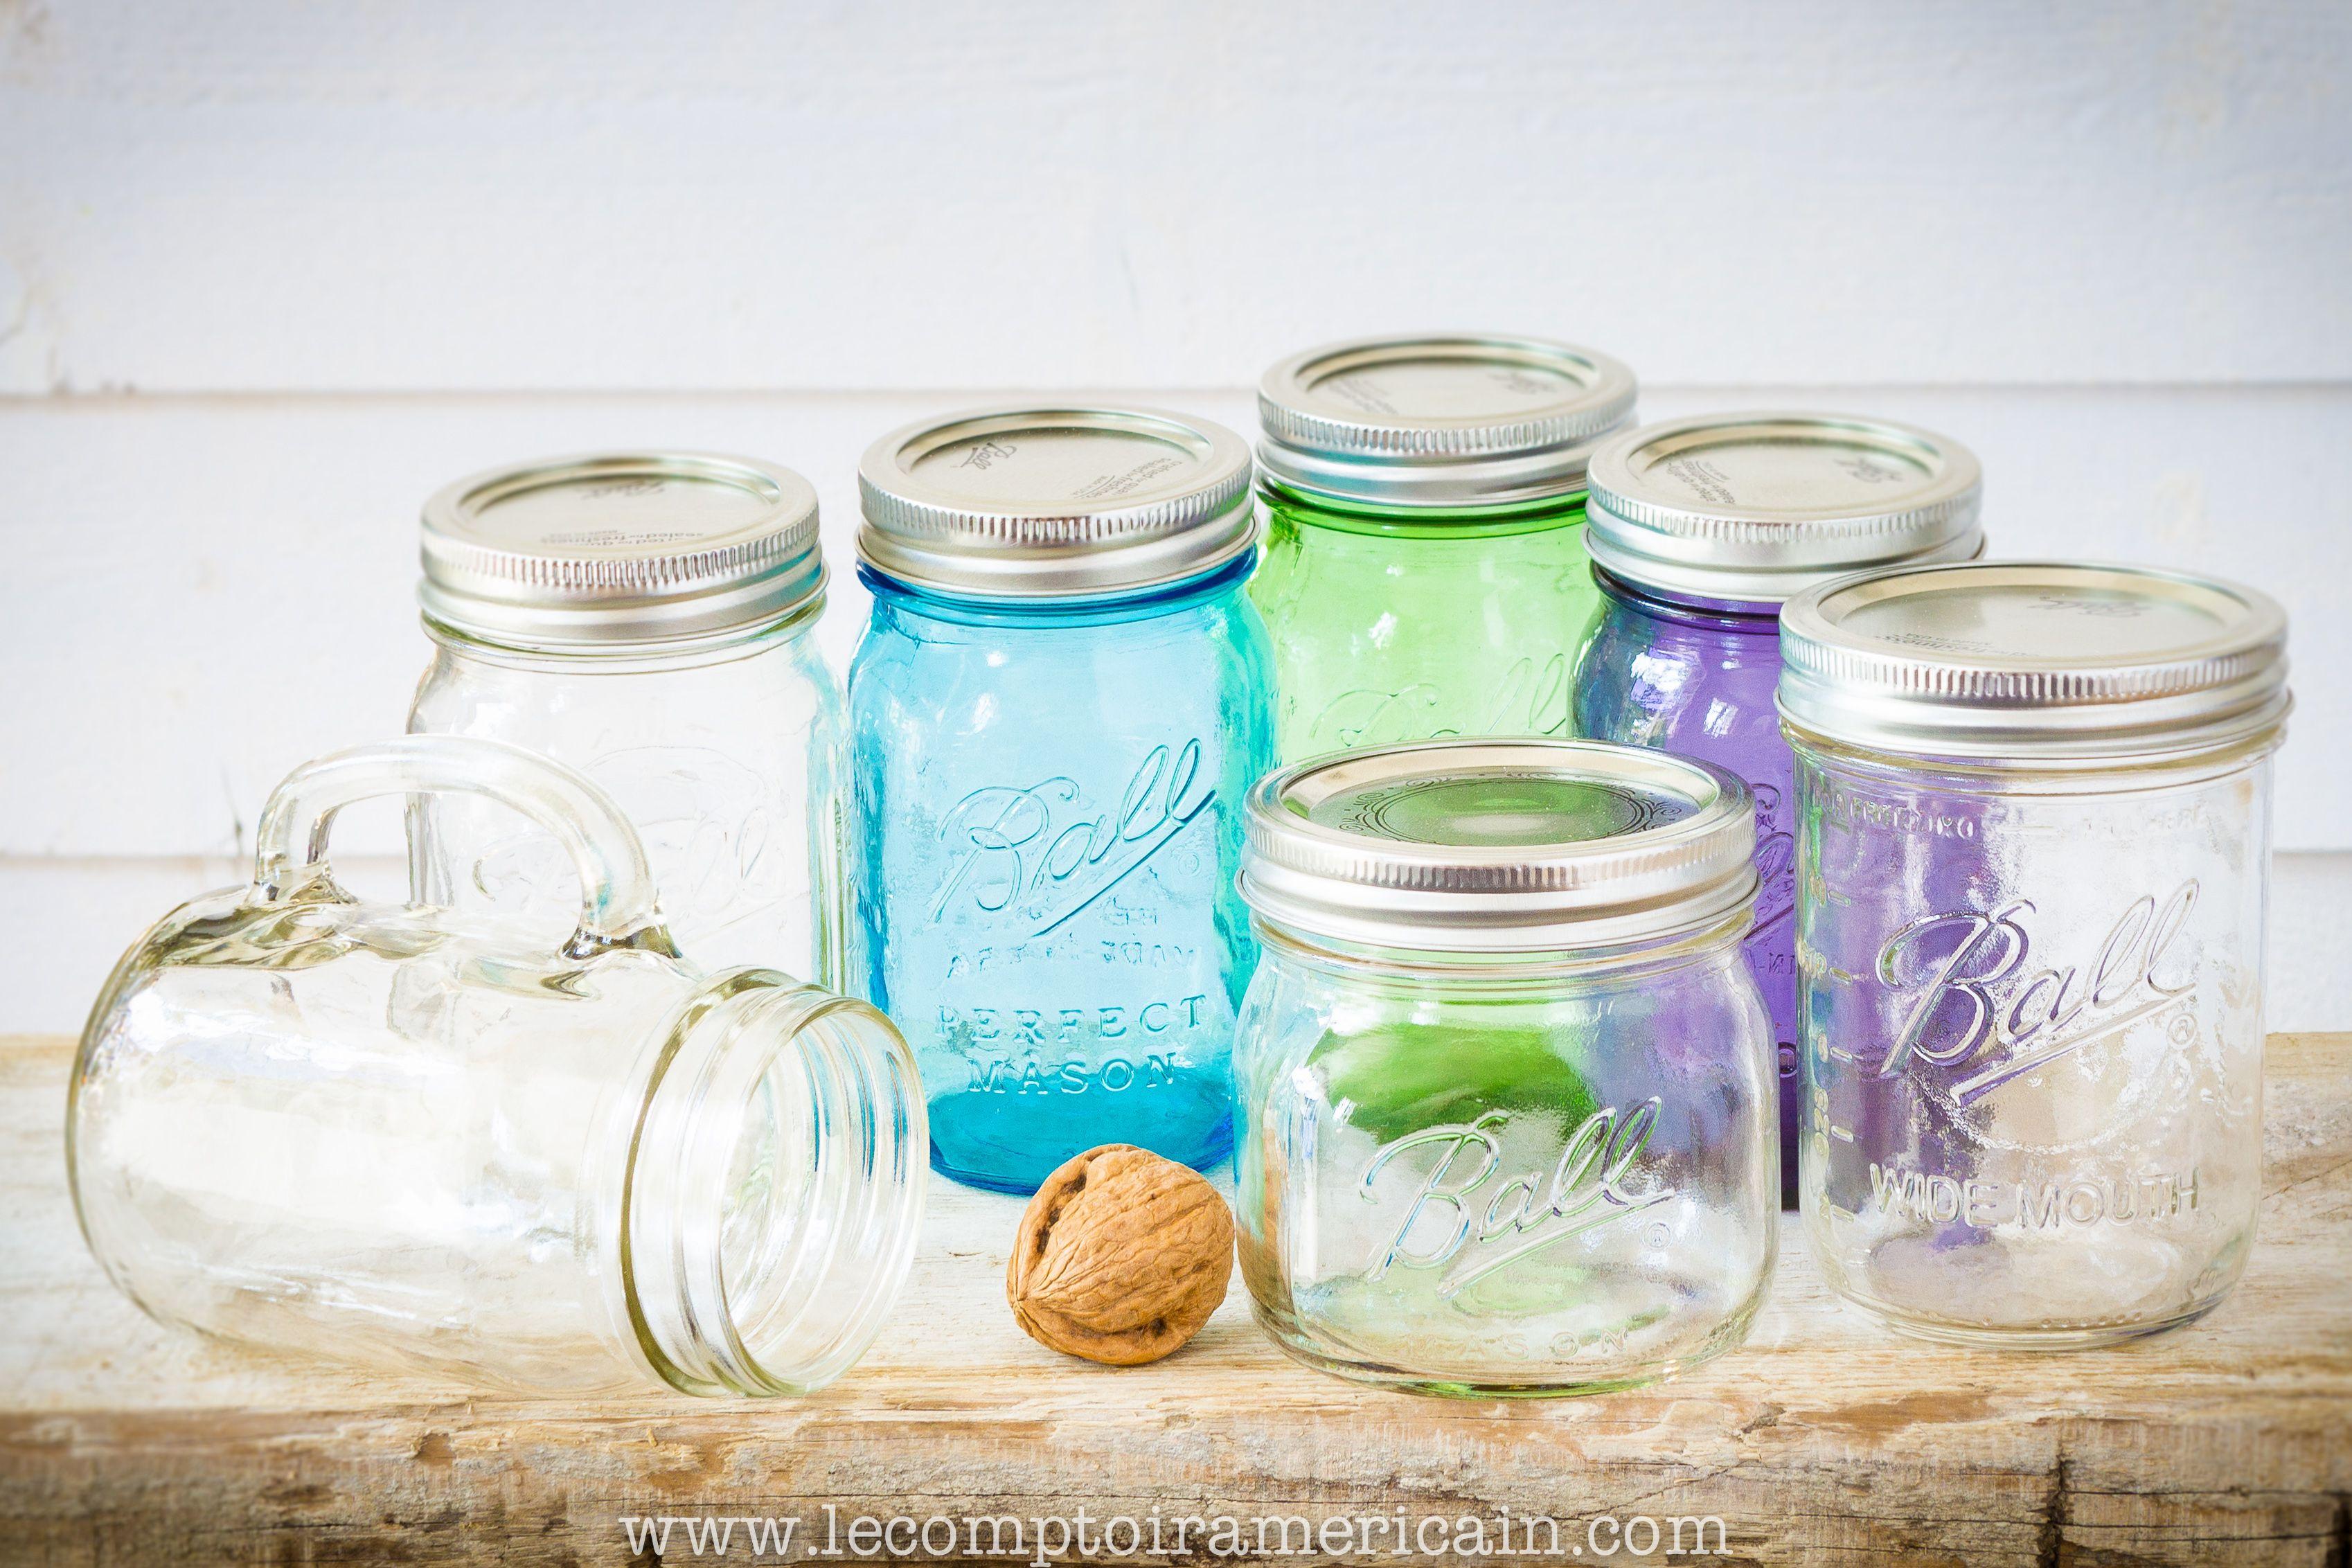 Bocaux Mason Jar #madeinUSA #americanproduct #americanmade #lecomptoiramericain #Mason #jar #ball #ker #bocaux #bocal #verre #mug #16oz